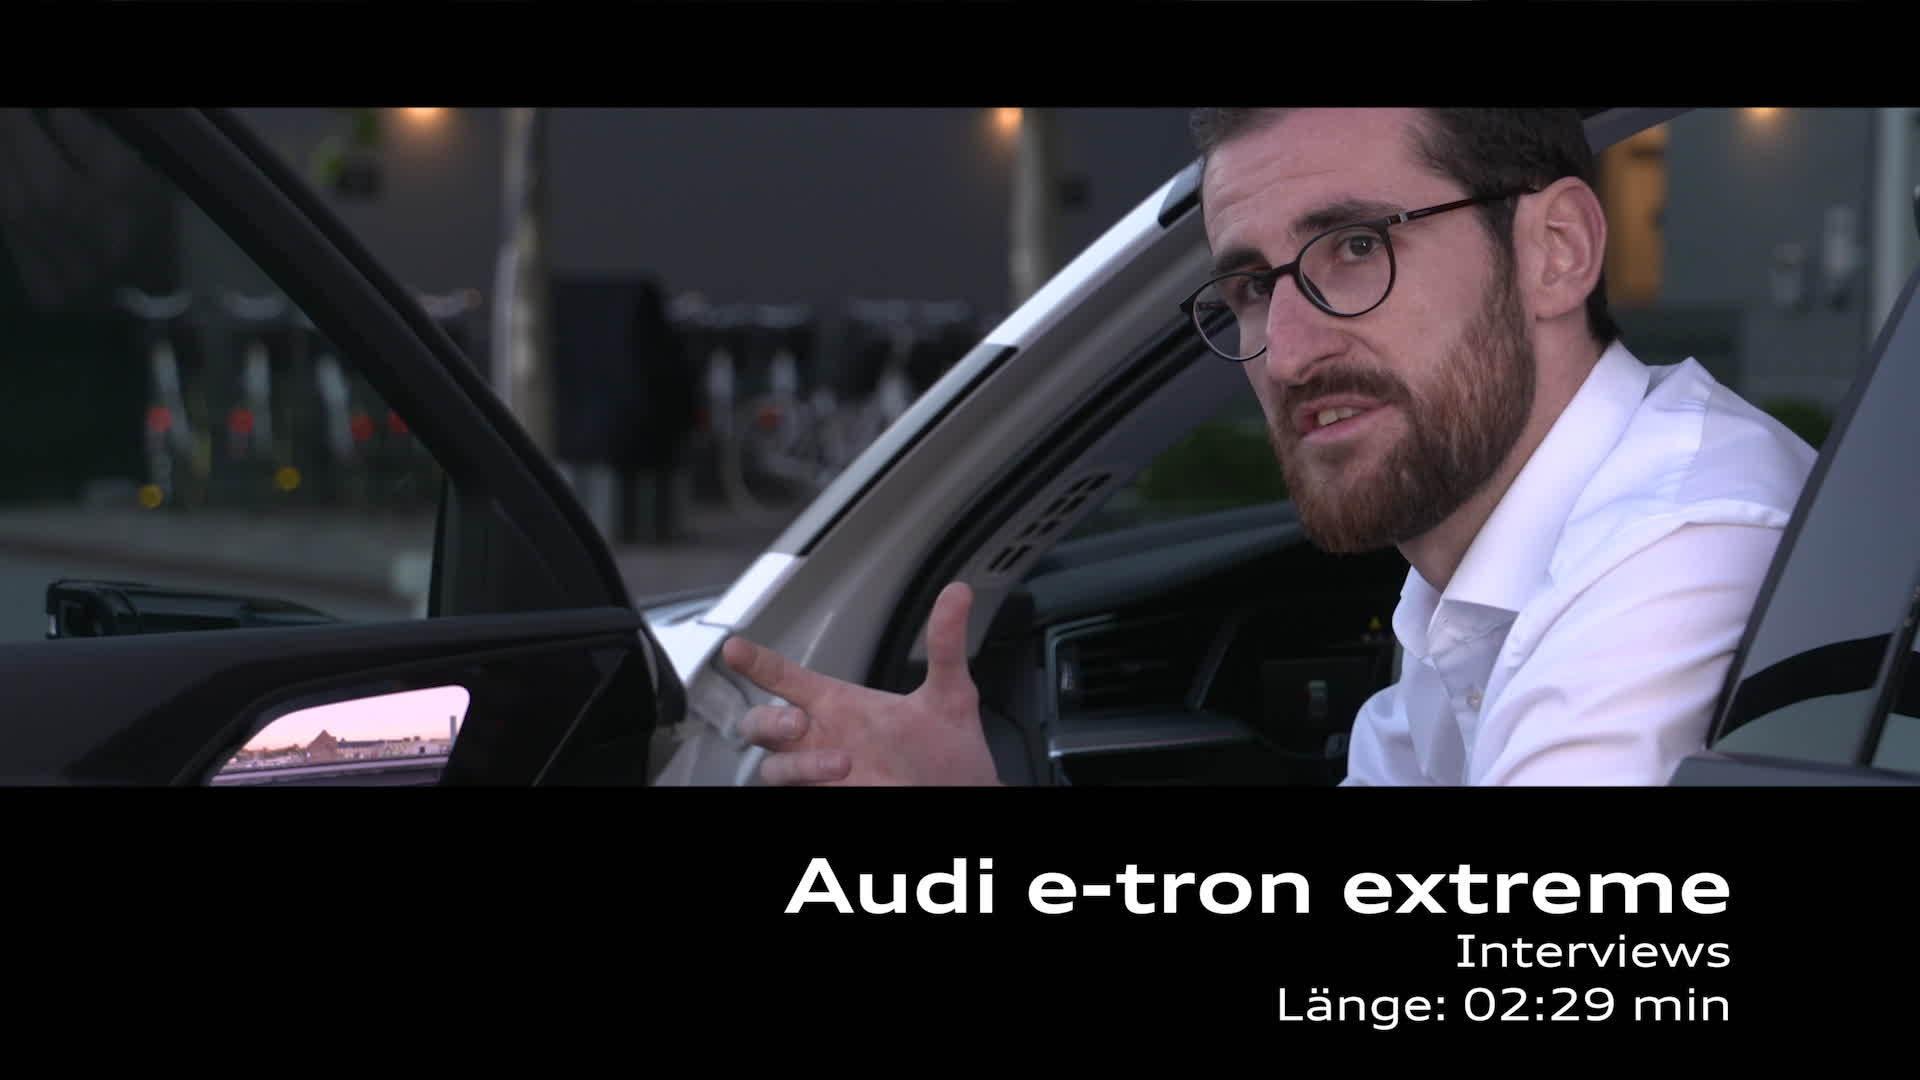 Audi e-tron extreme Interviews